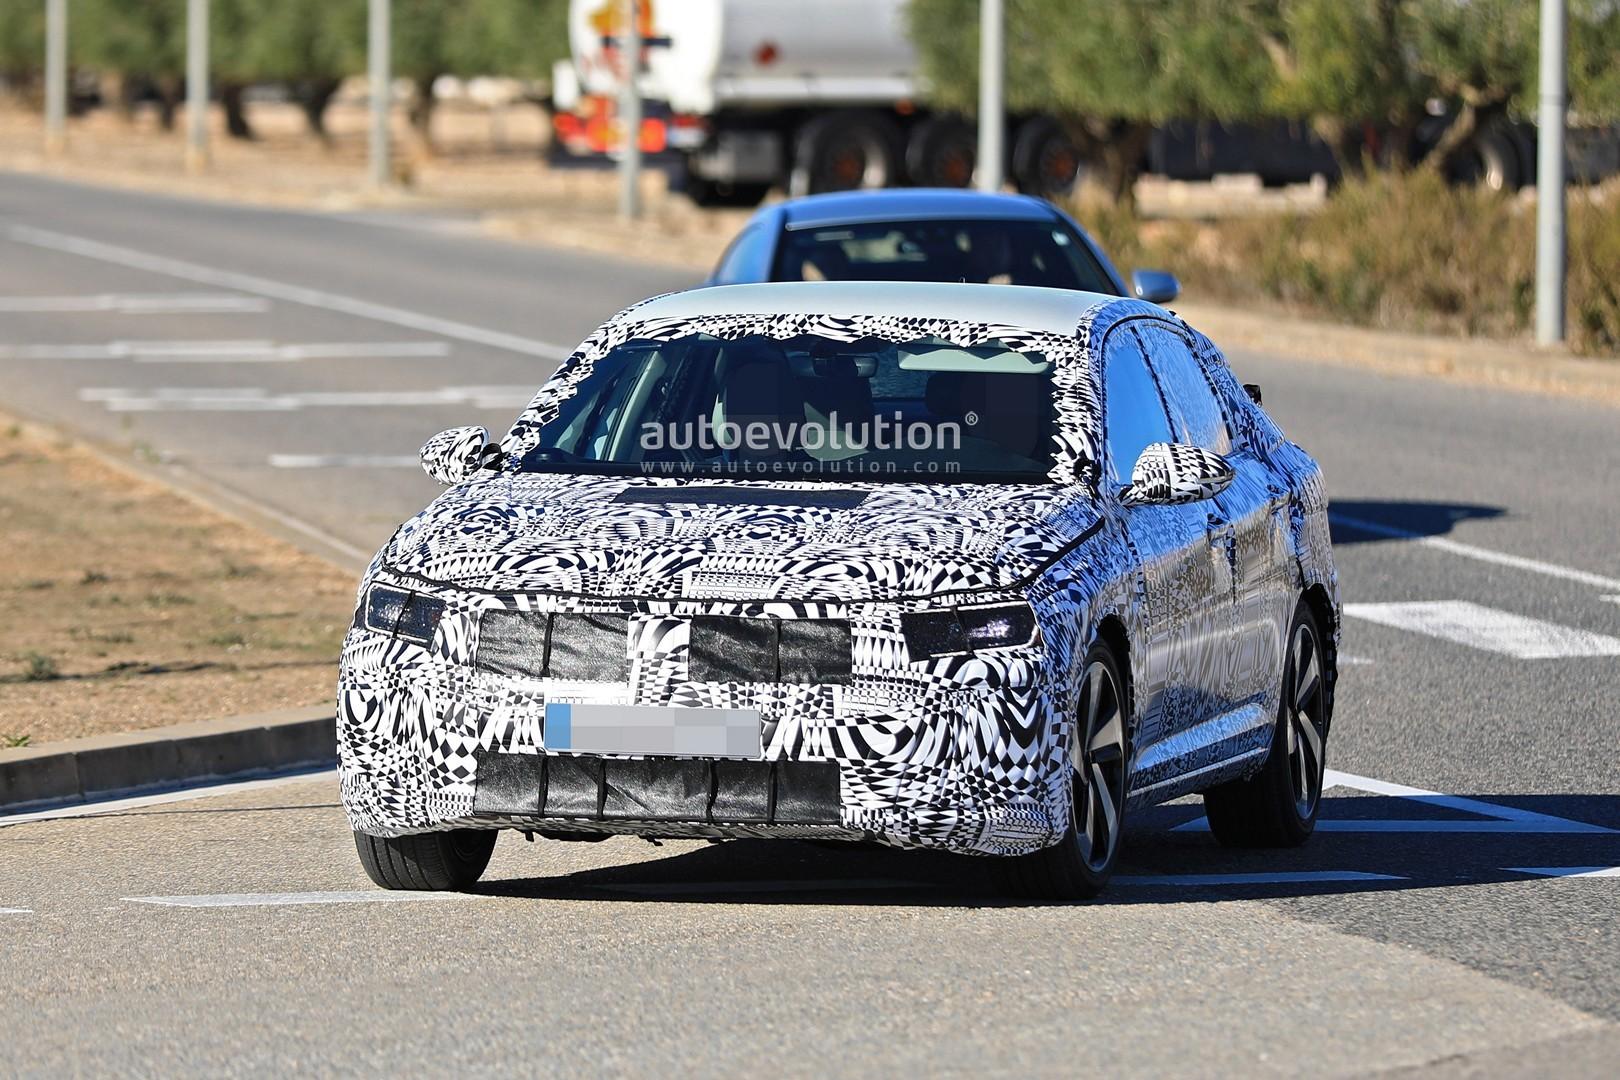 Spyshots: 2019 Volkswagen Jetta GLI Has GTI Twin Exhaust and 18-Inch Wheels - autoevolution